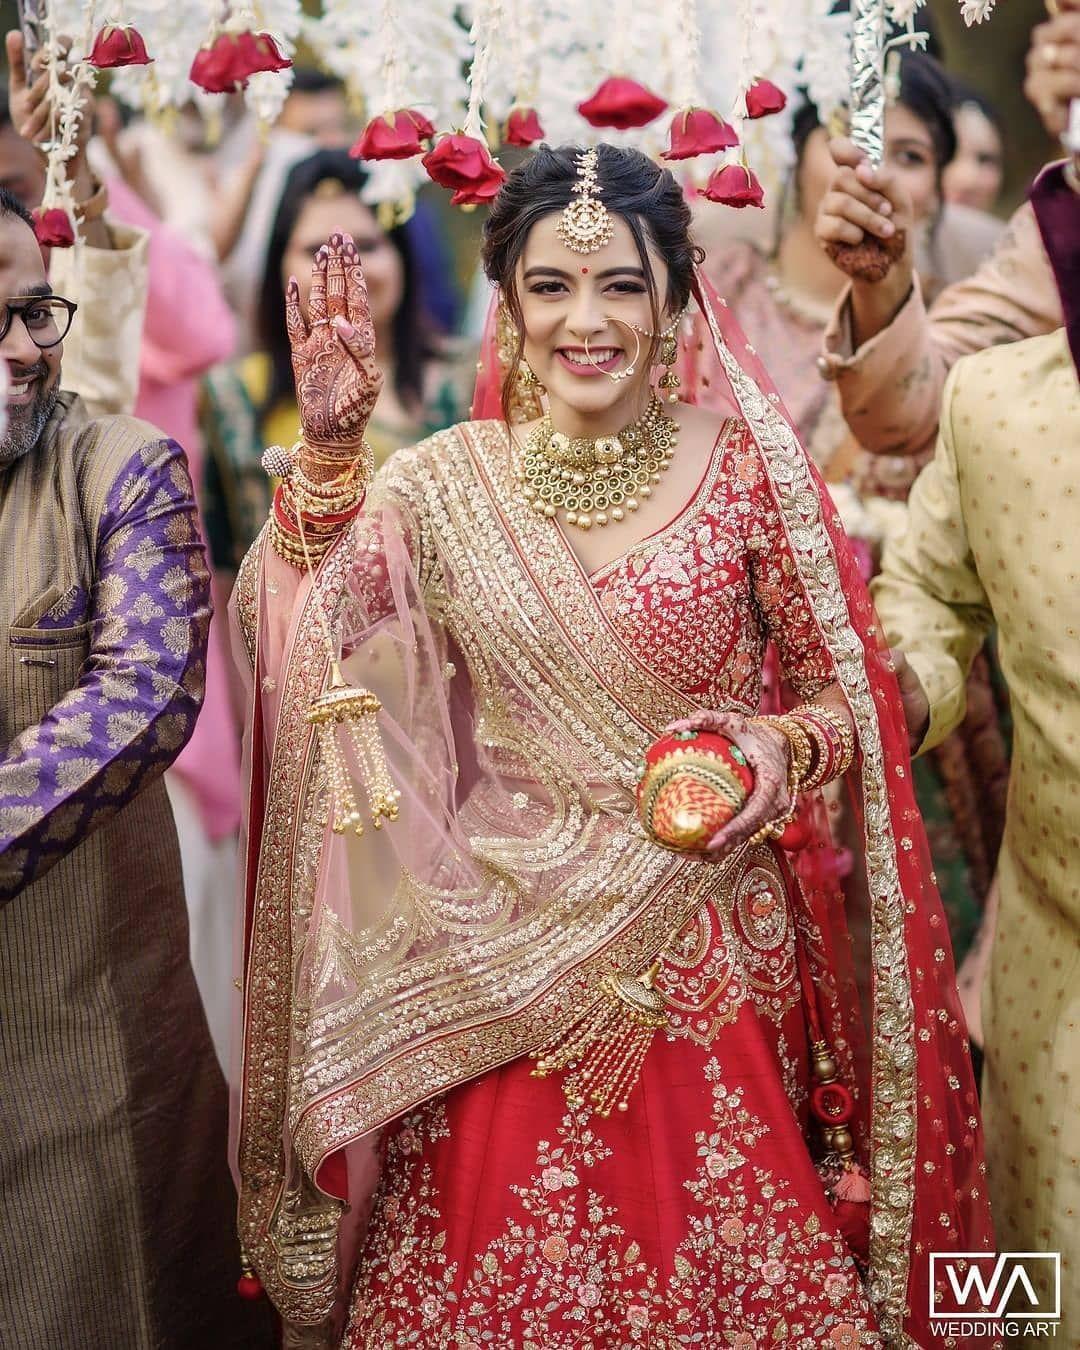 Indian Wedding Photo Ideas In 2020 Indian Bridal Fashion Indian Bridal Photos Indian Bridal Outfits